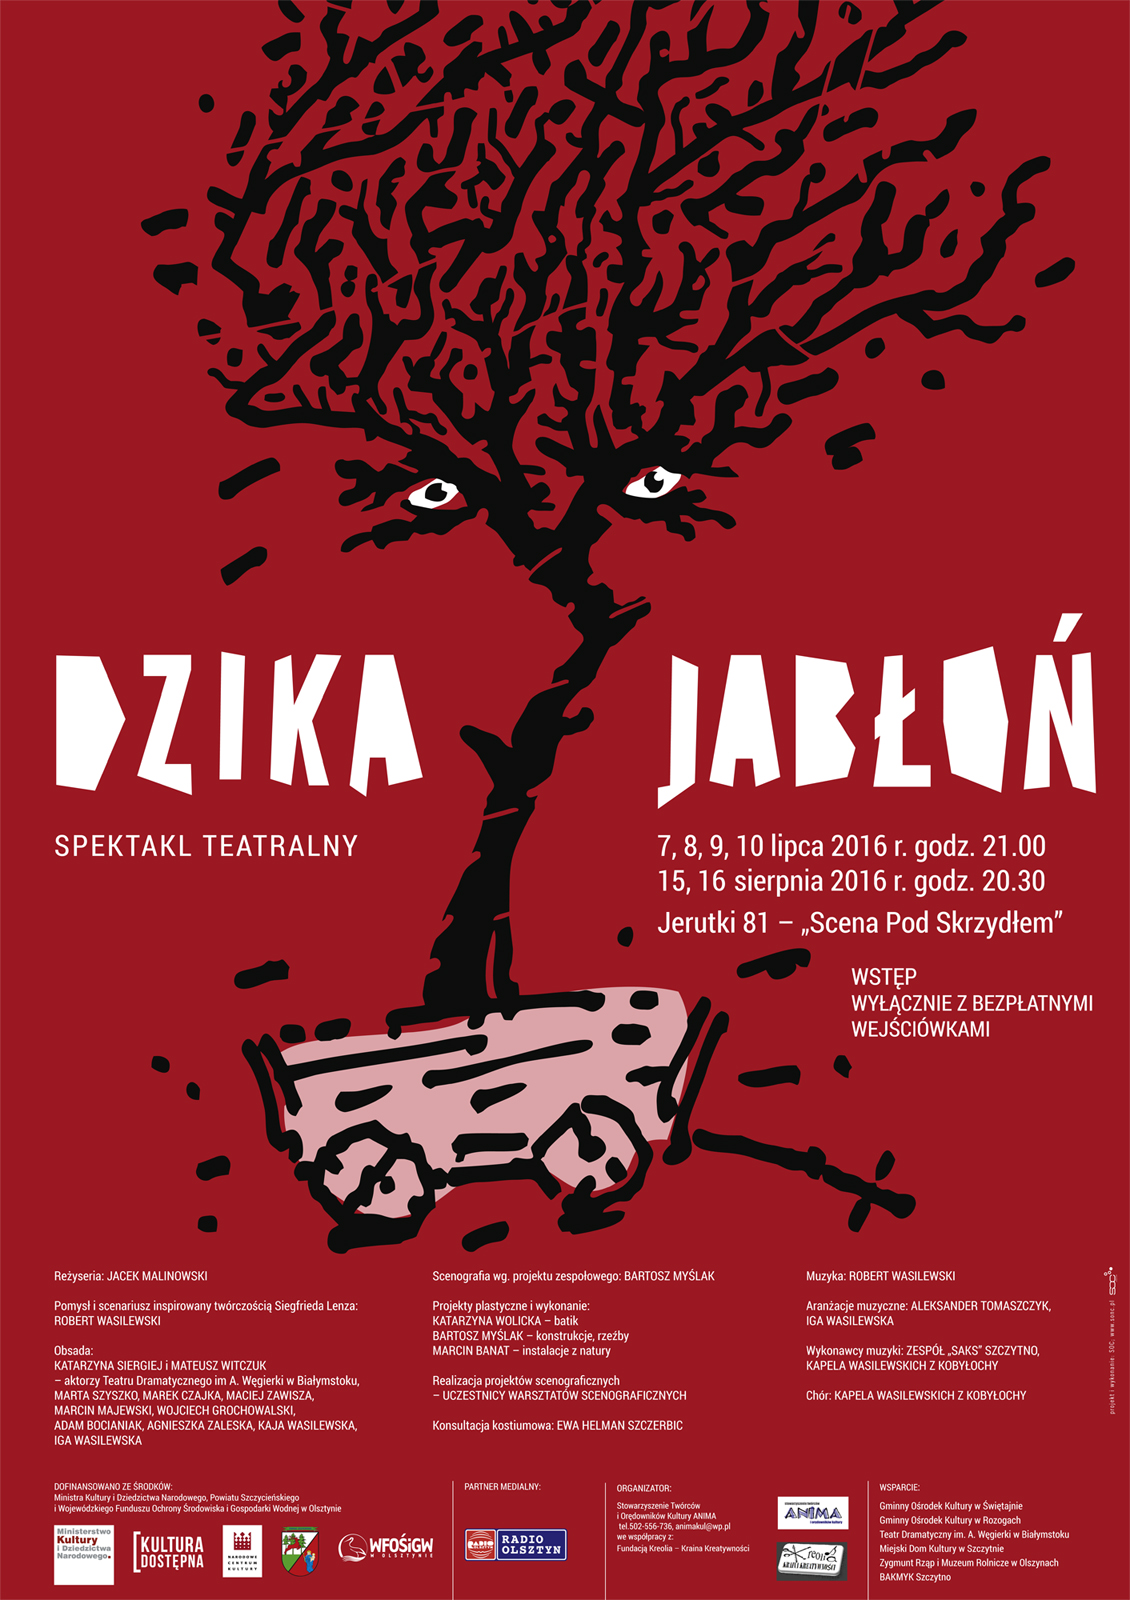 jablon-plakat-B2-2.indd